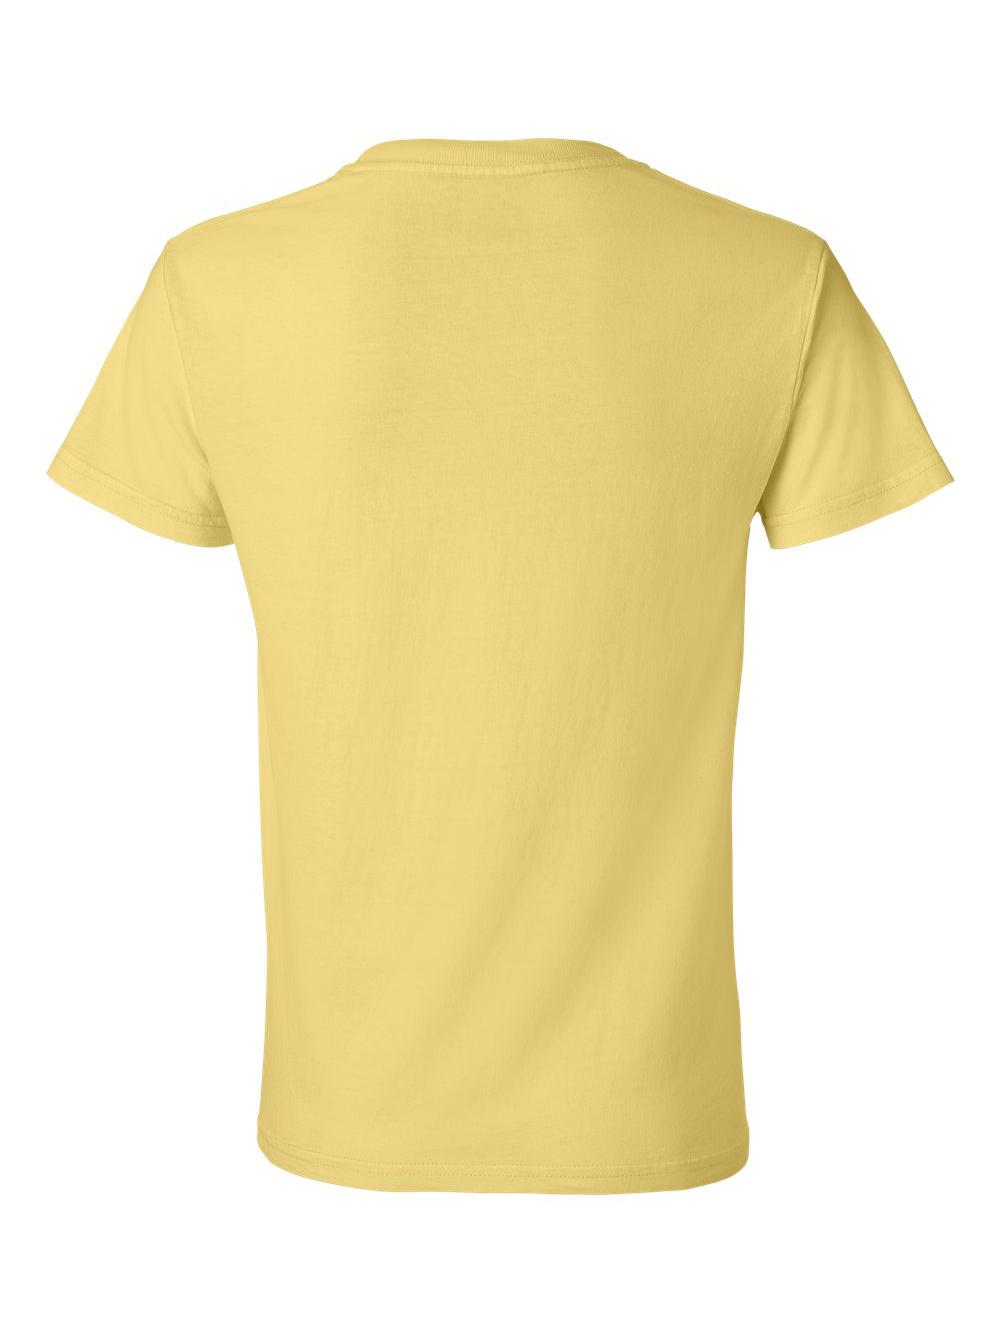 Comfort-Colors-Pigment-Dyed-Ringspun-Women-039-s-Short-Sleeve-T-Shirt-3333 thumbnail 7